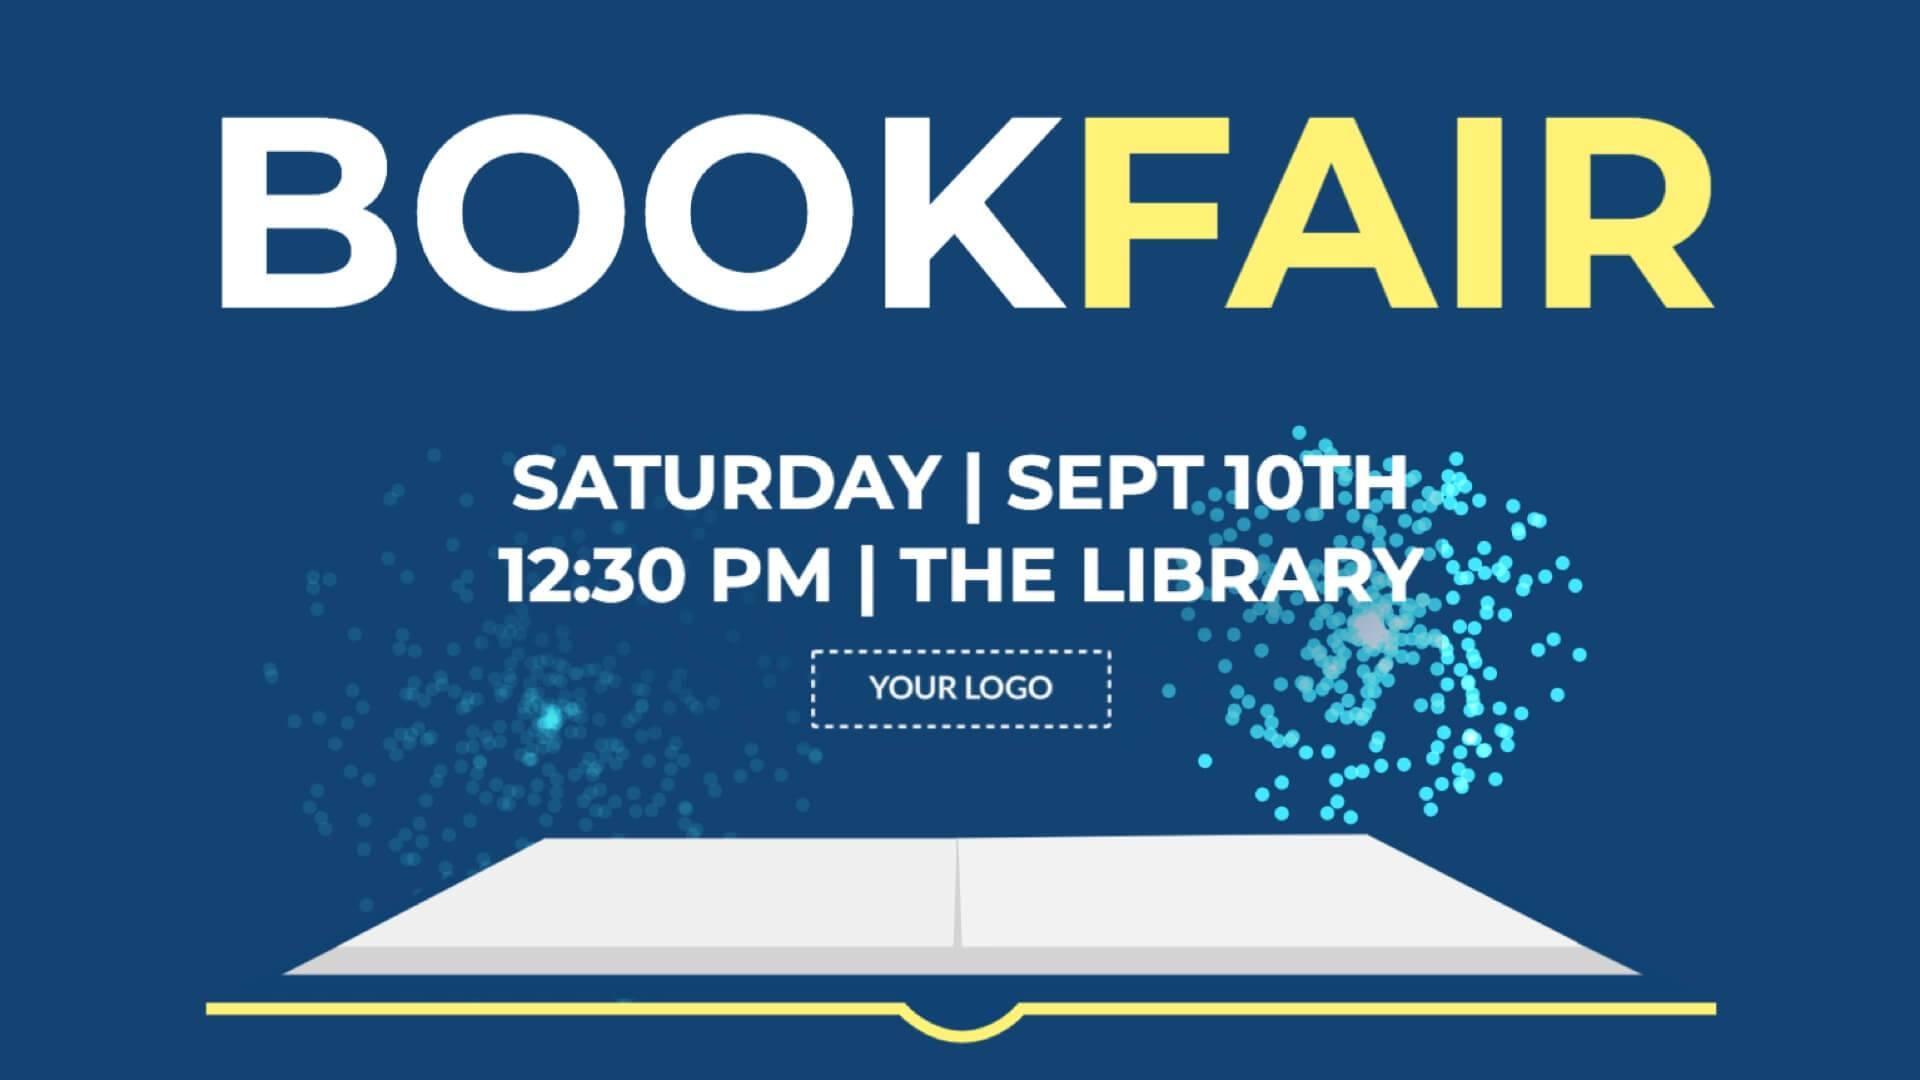 Announcement Book Fair Digital Signage Template